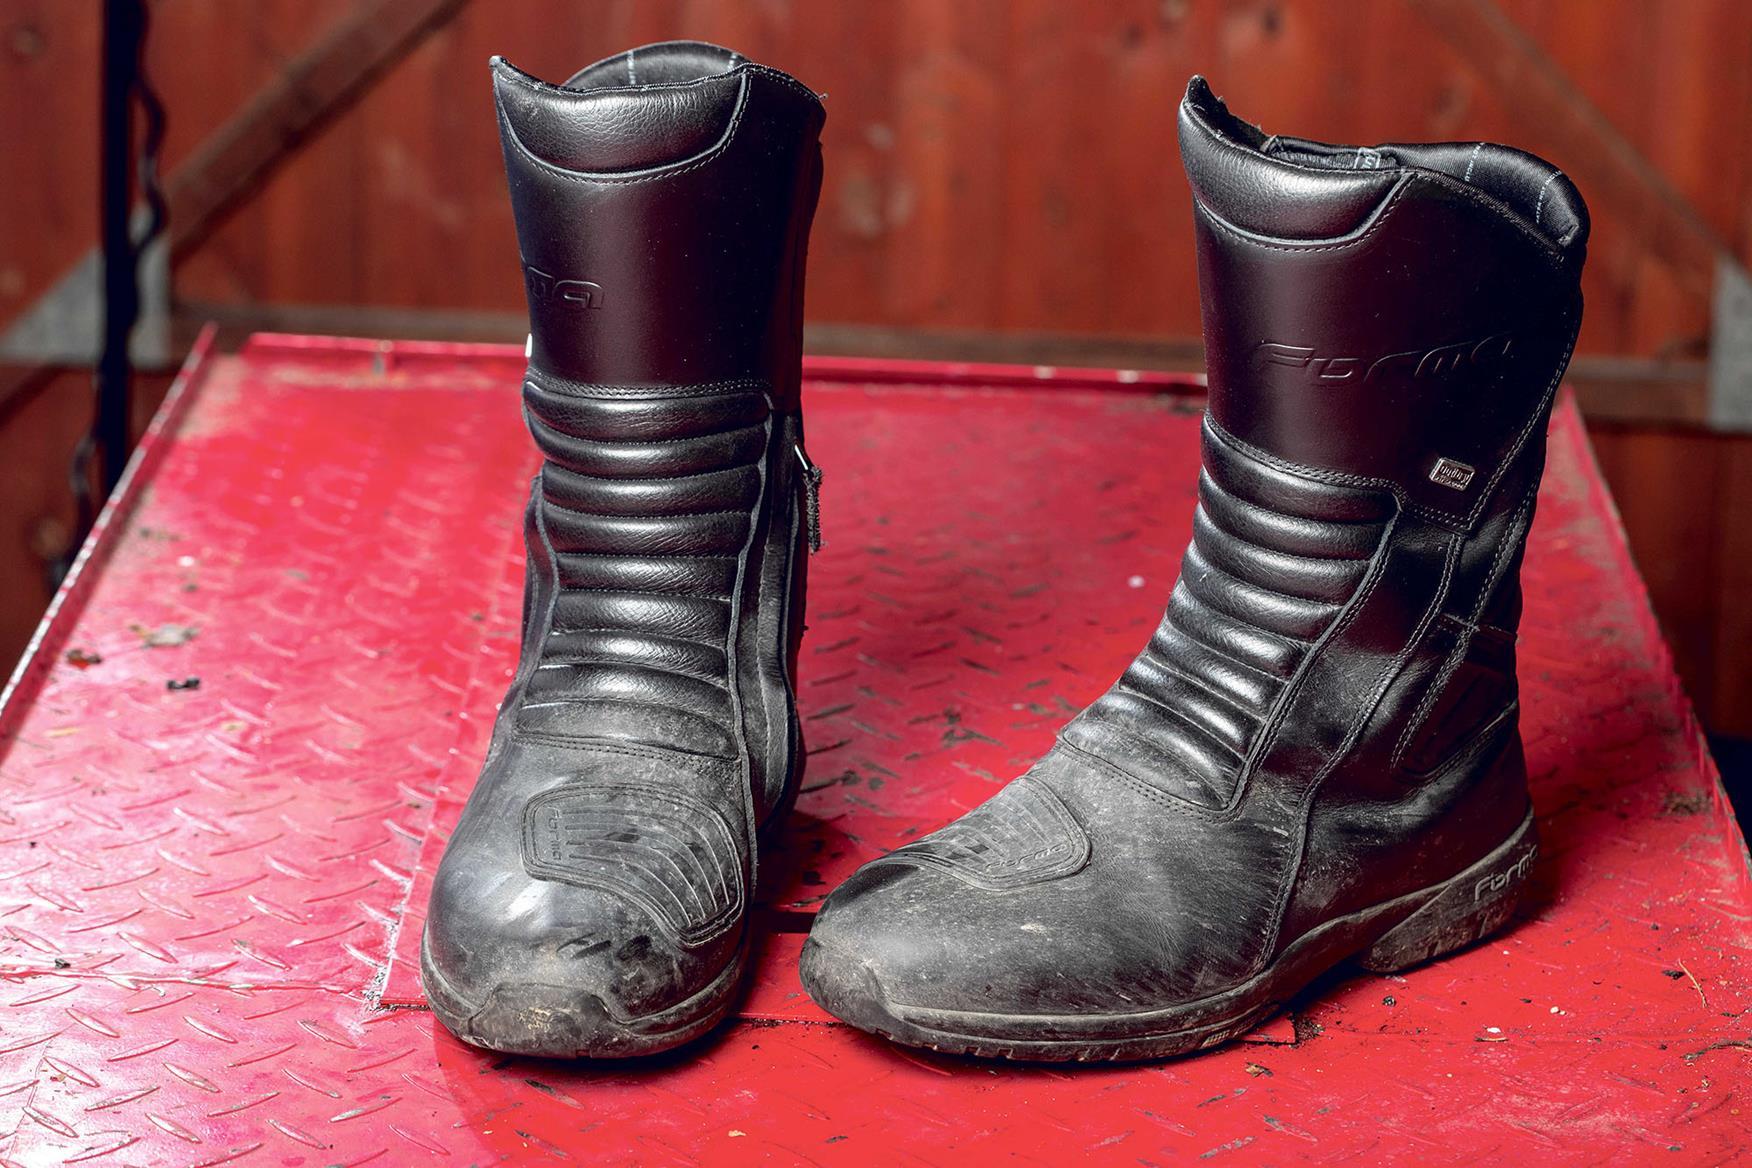 Forma Jasper Outdry boots